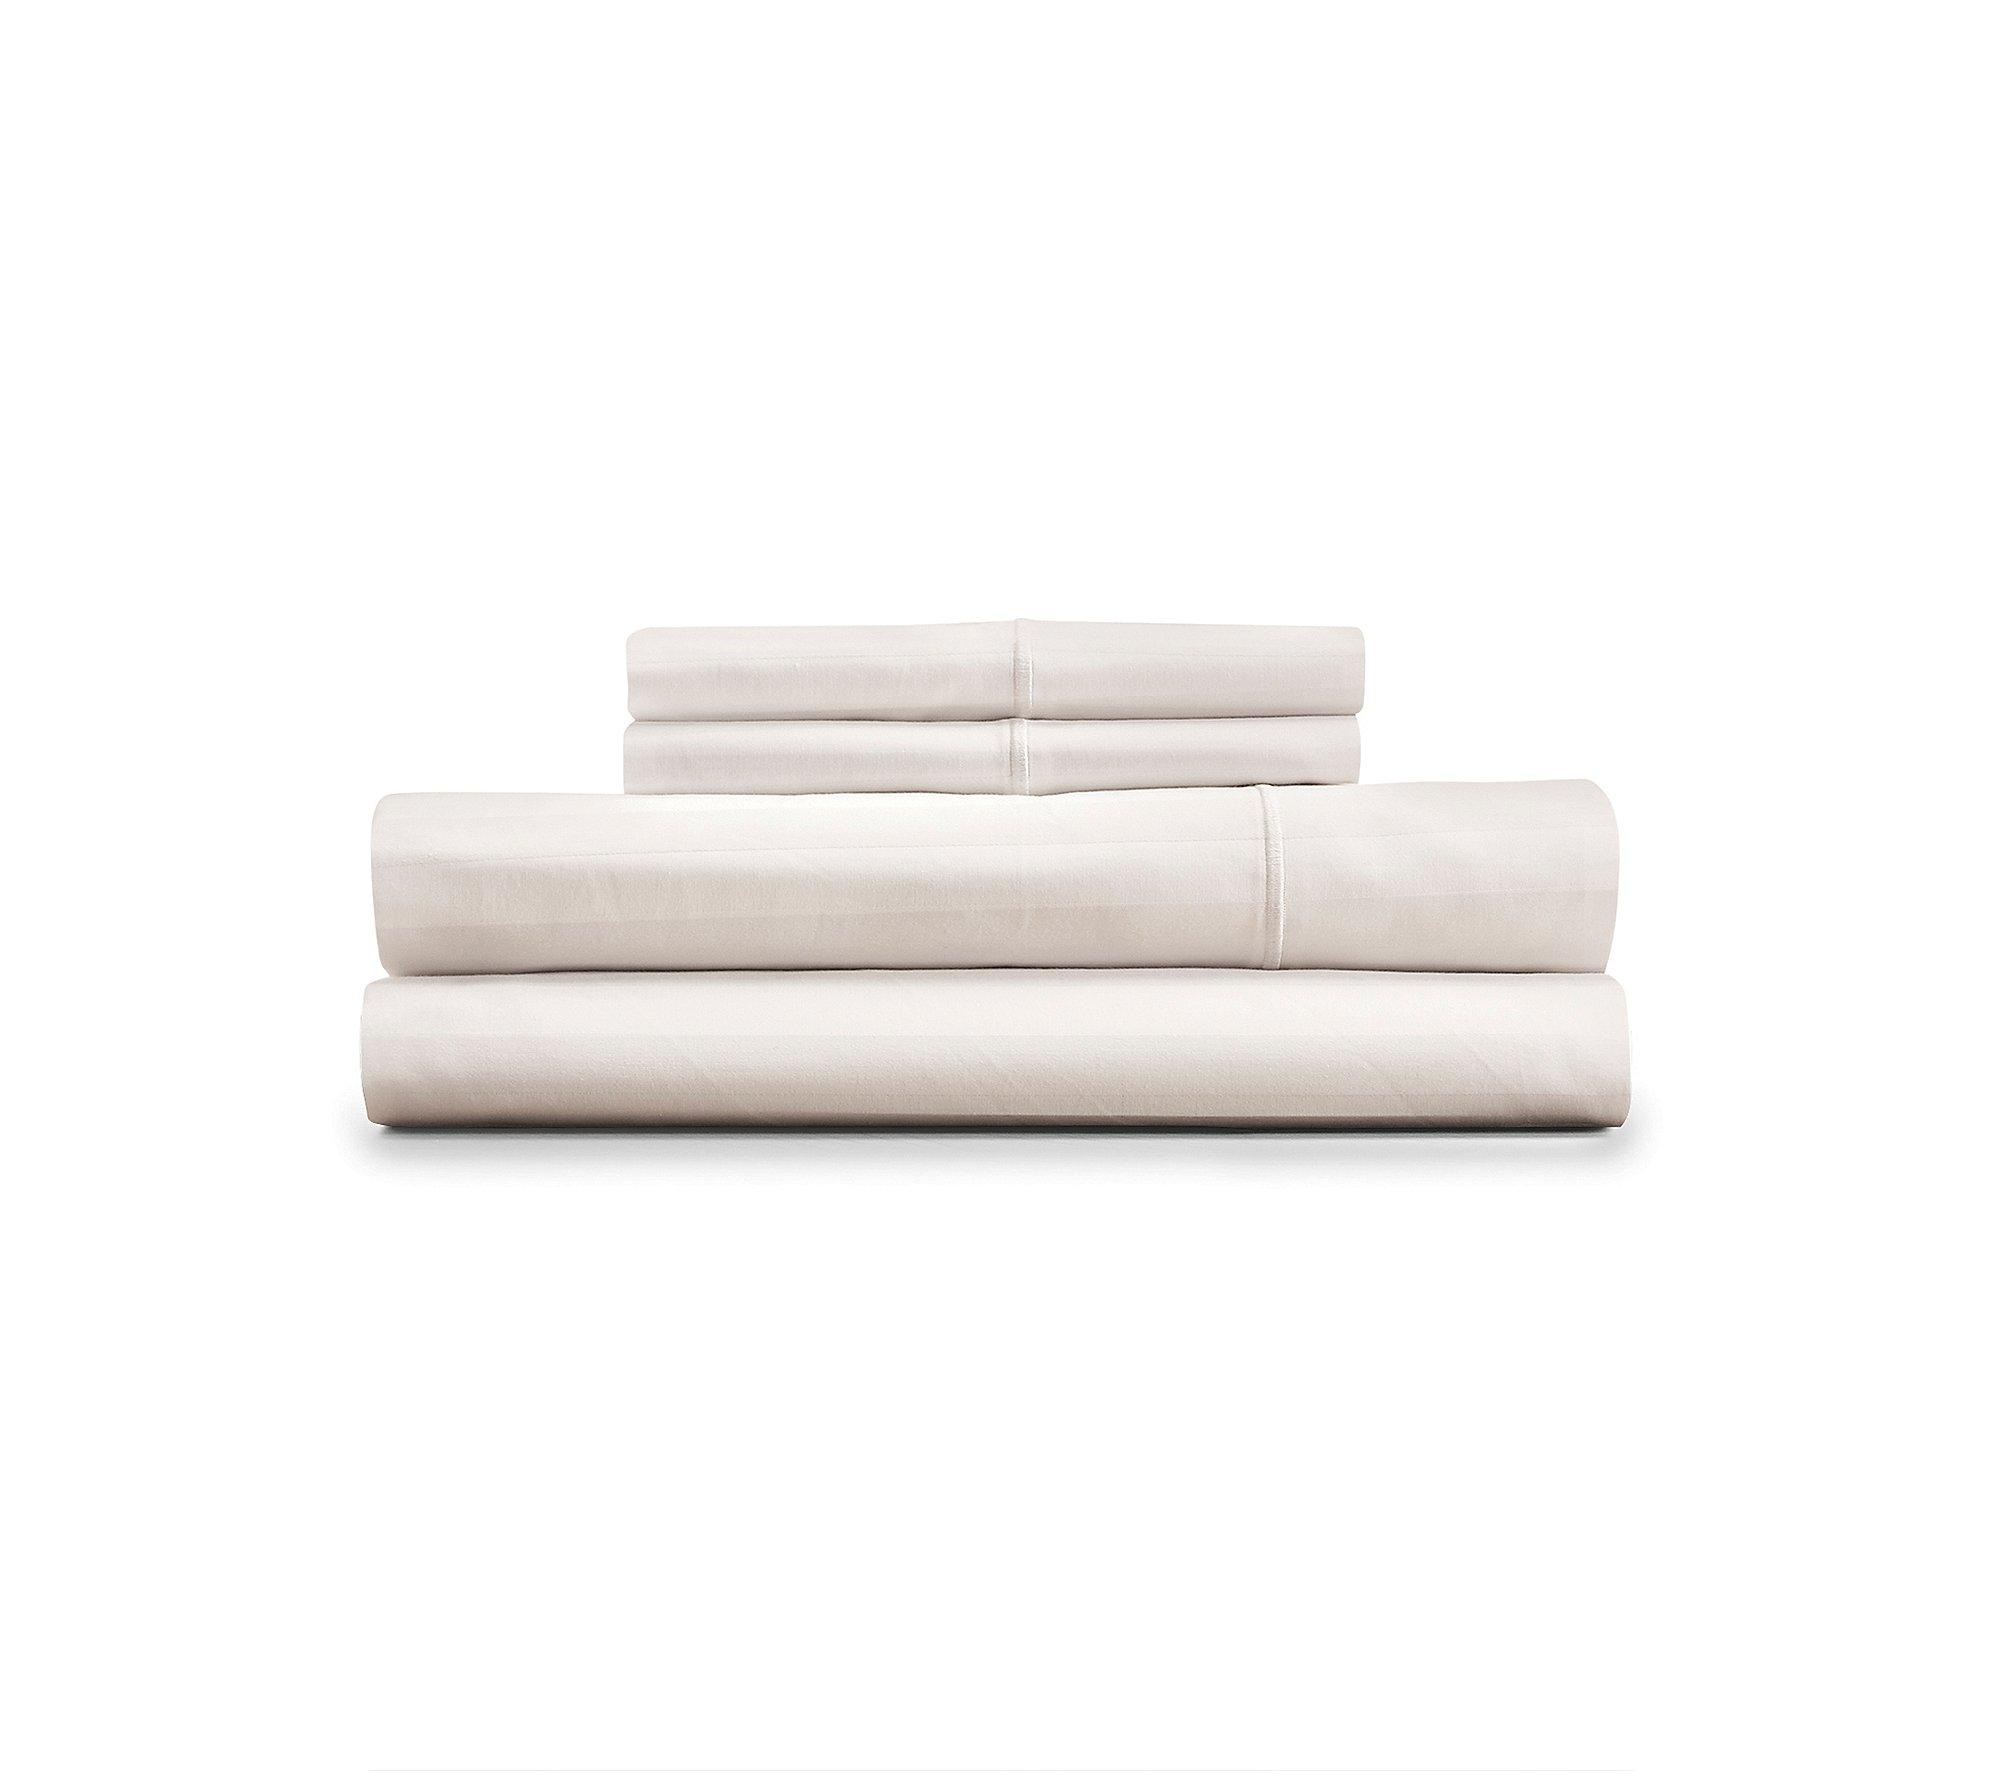 CASA by Victor Alfaro 500 Thread Count 4 pc. Sheet Set Ivory Damask King Sheet Set